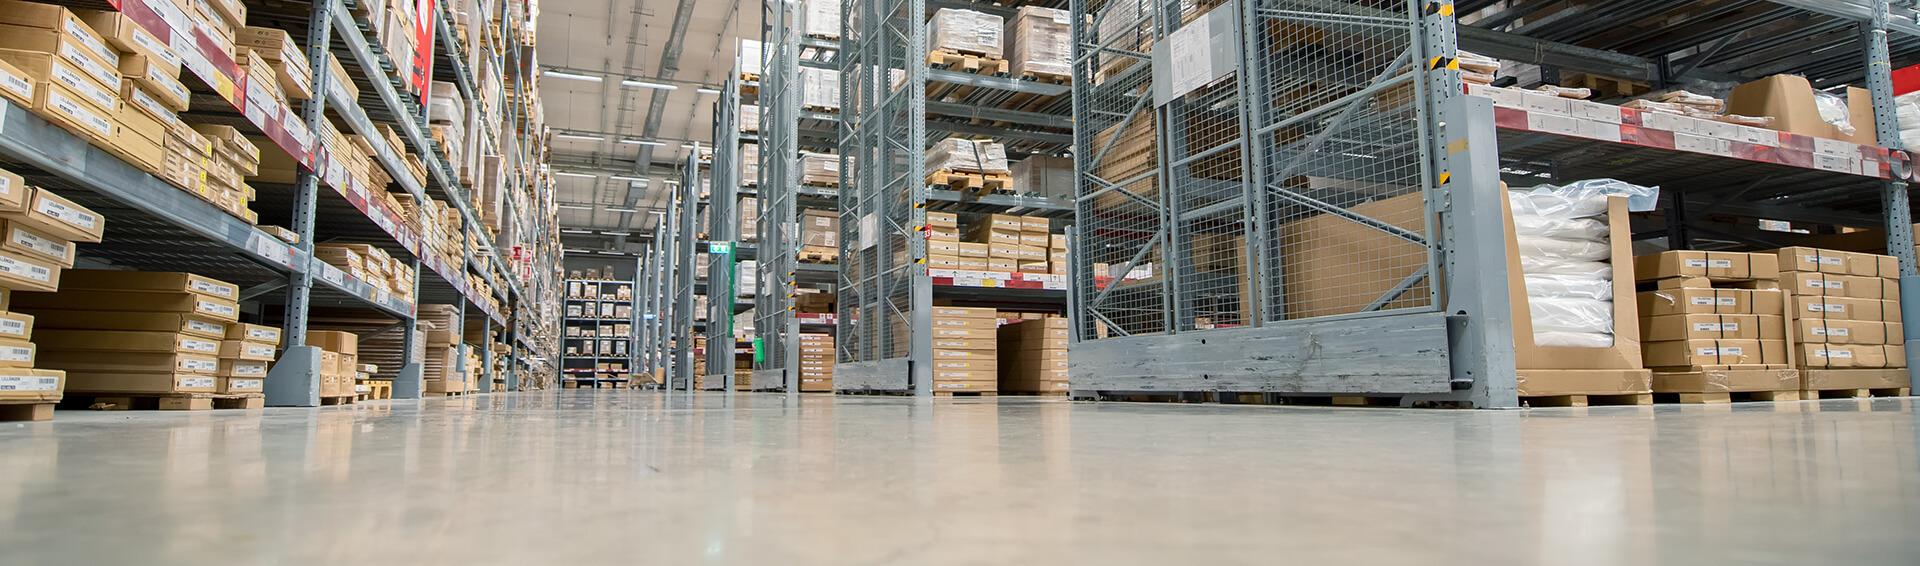 distribution warehouse polyaspartic coating flooring